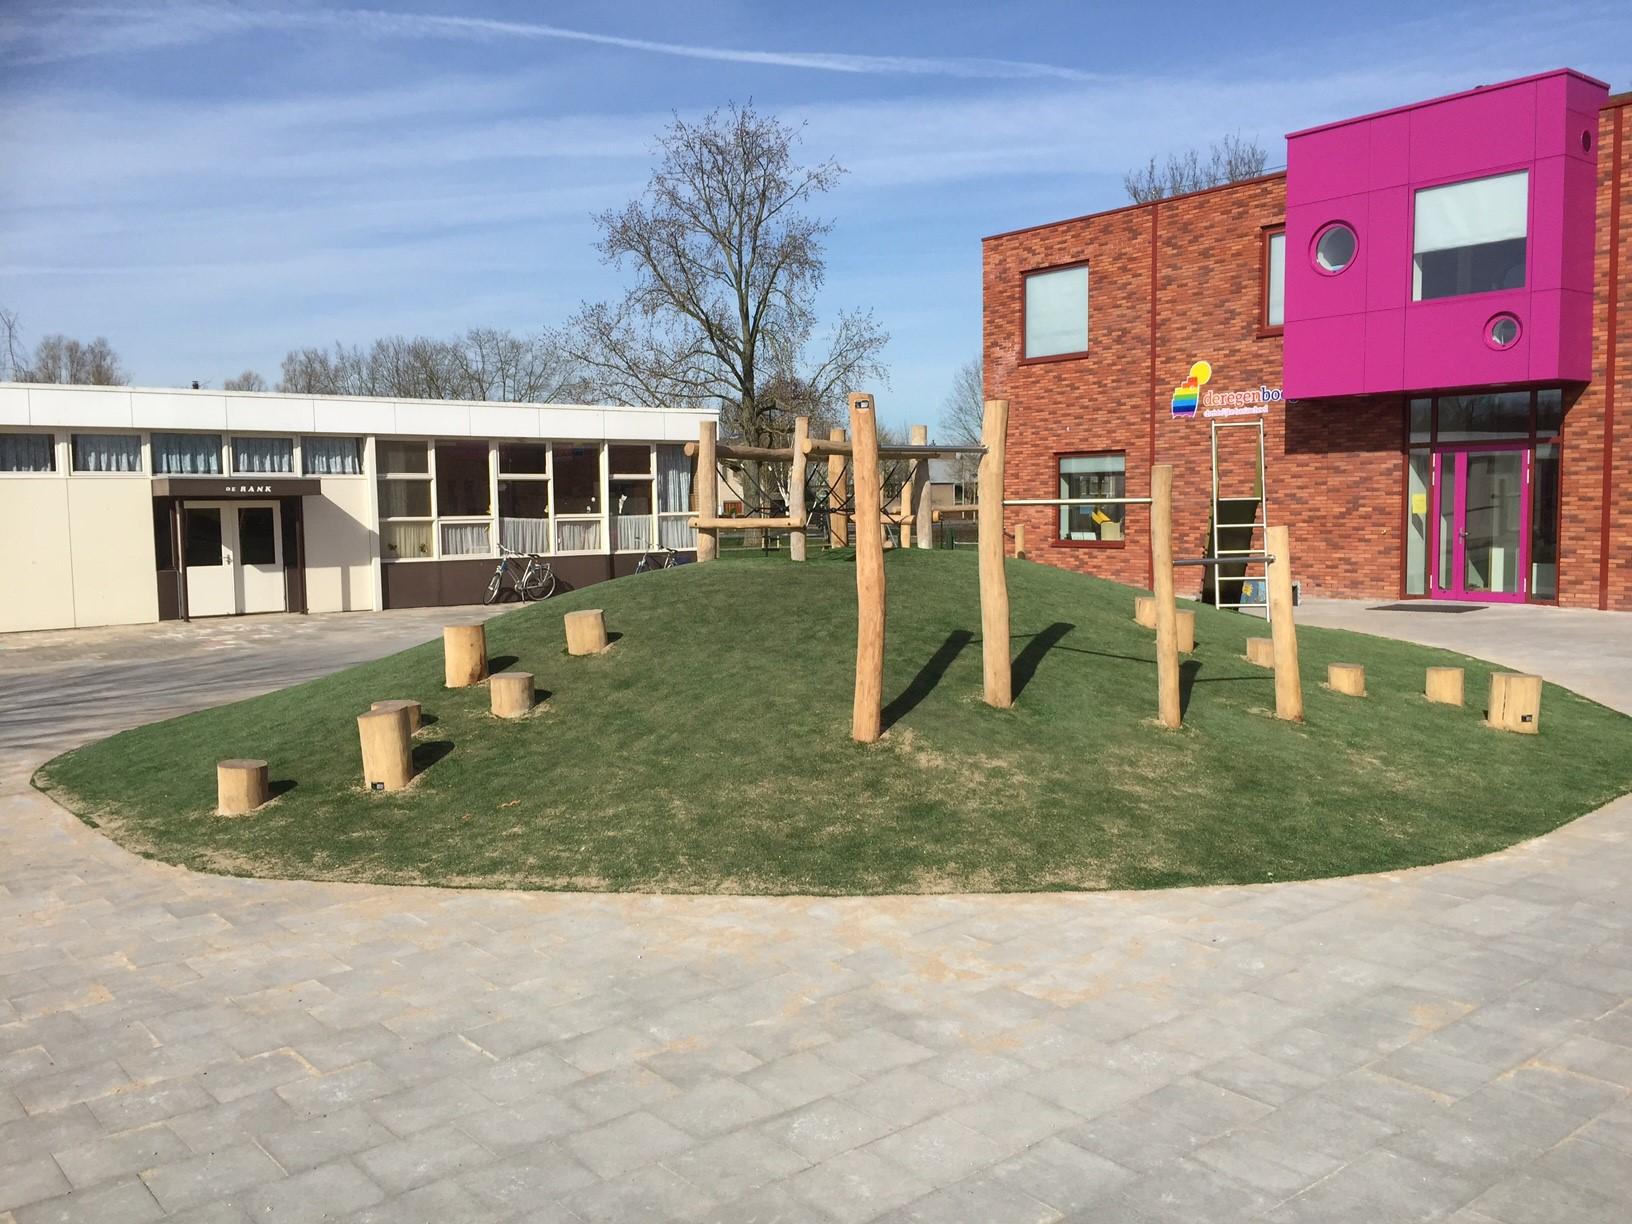 Kindcentrum Woldwijck, Hoogezand